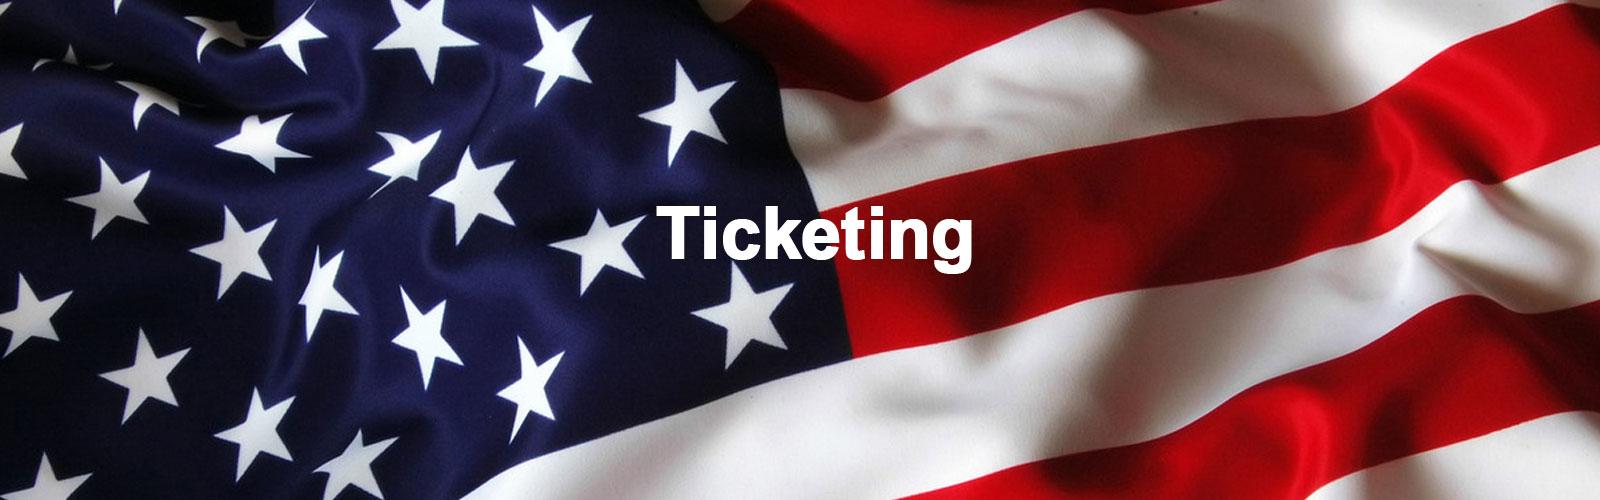 ticketing-usa